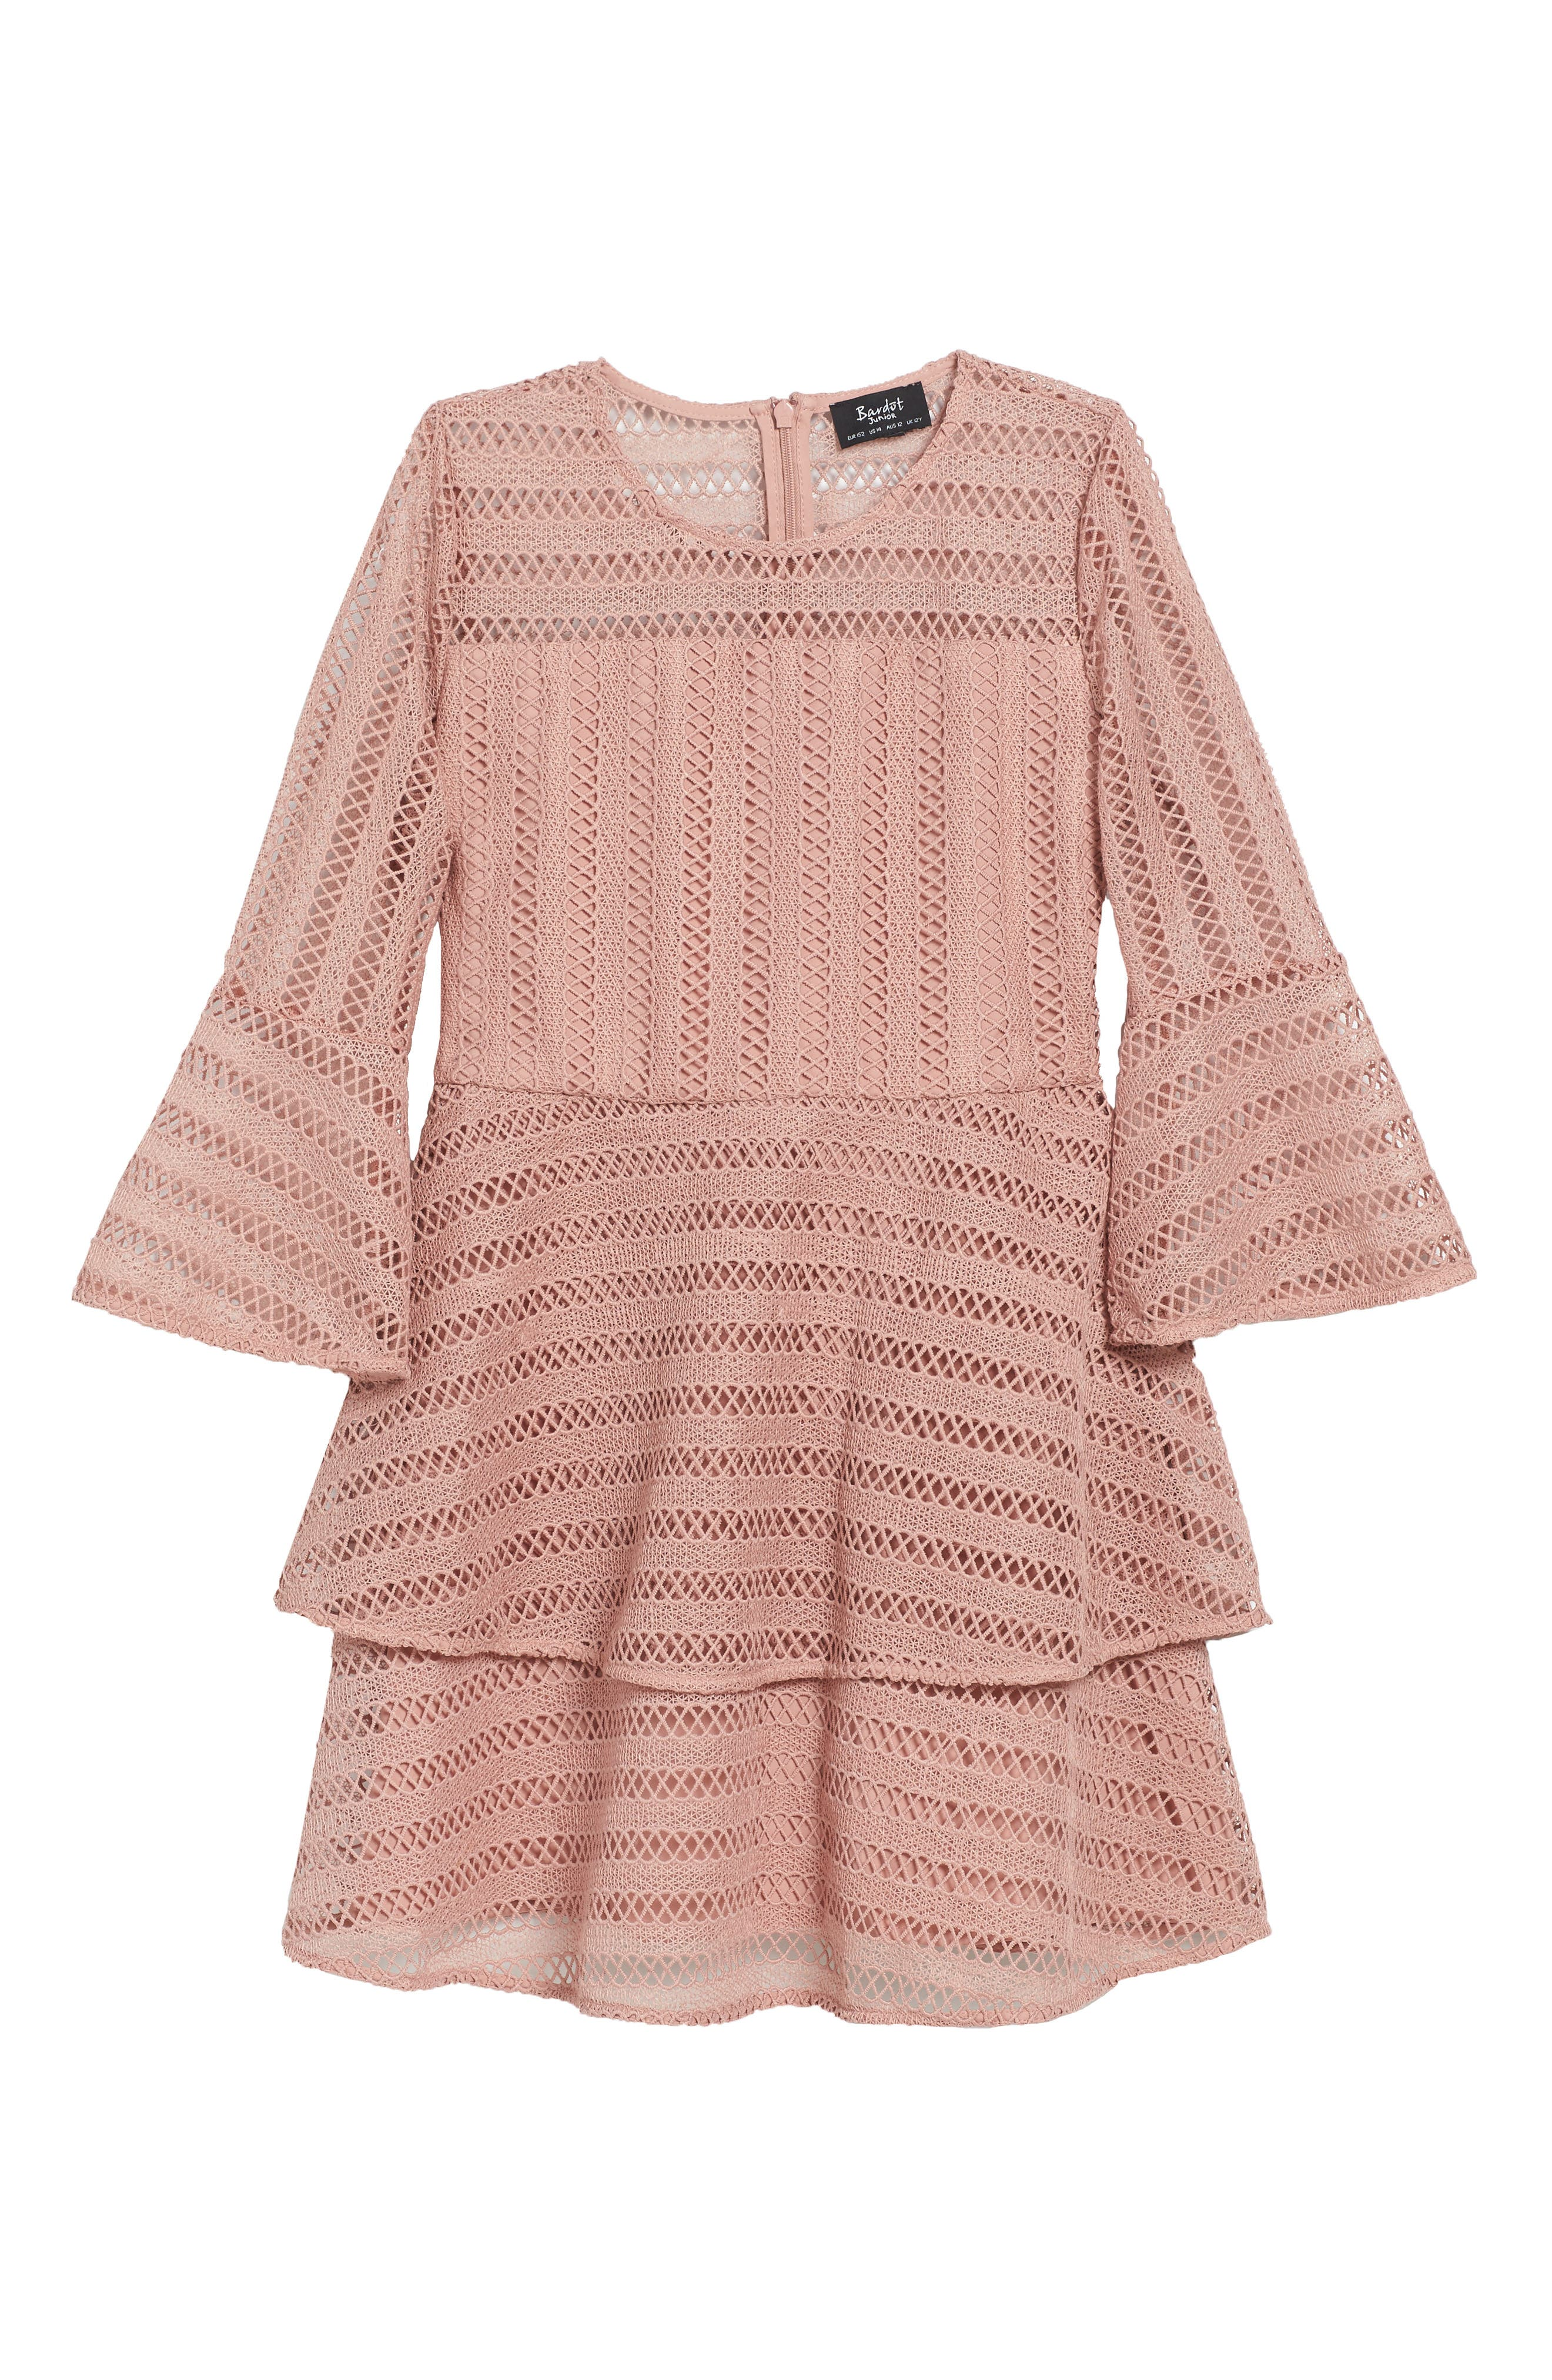 Main Image - Bardot Junior Collins Lace Dress (Big Girls)